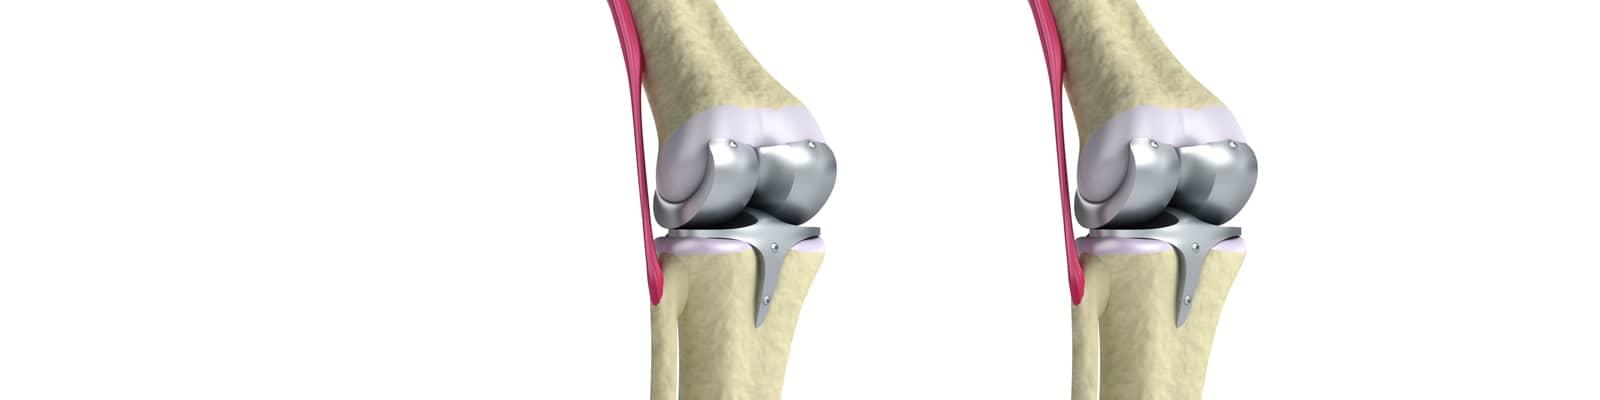 Protesis de rodilla